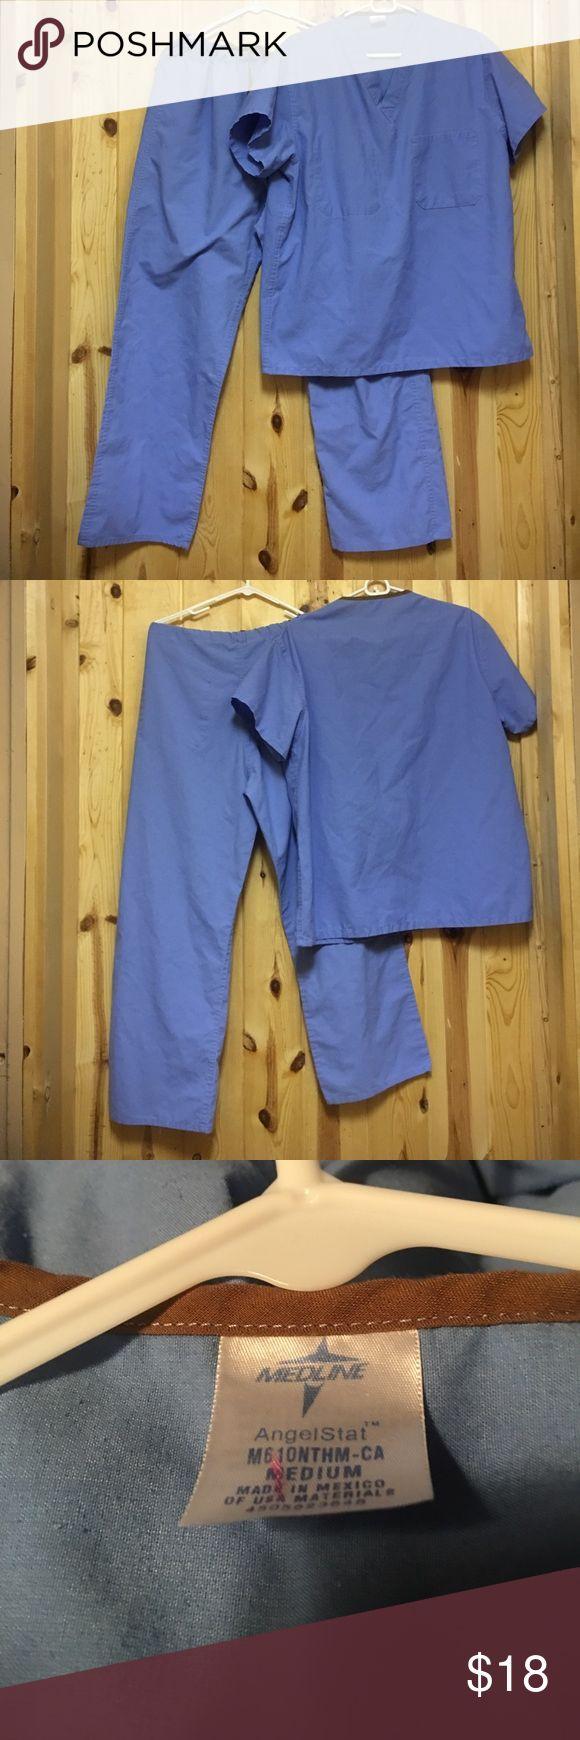 "Med line Scrub Set Medium Reversible GUC Med line Scrub Set Medium Reversible GUC Ceil Blue Inseam  28"" Medline Other"